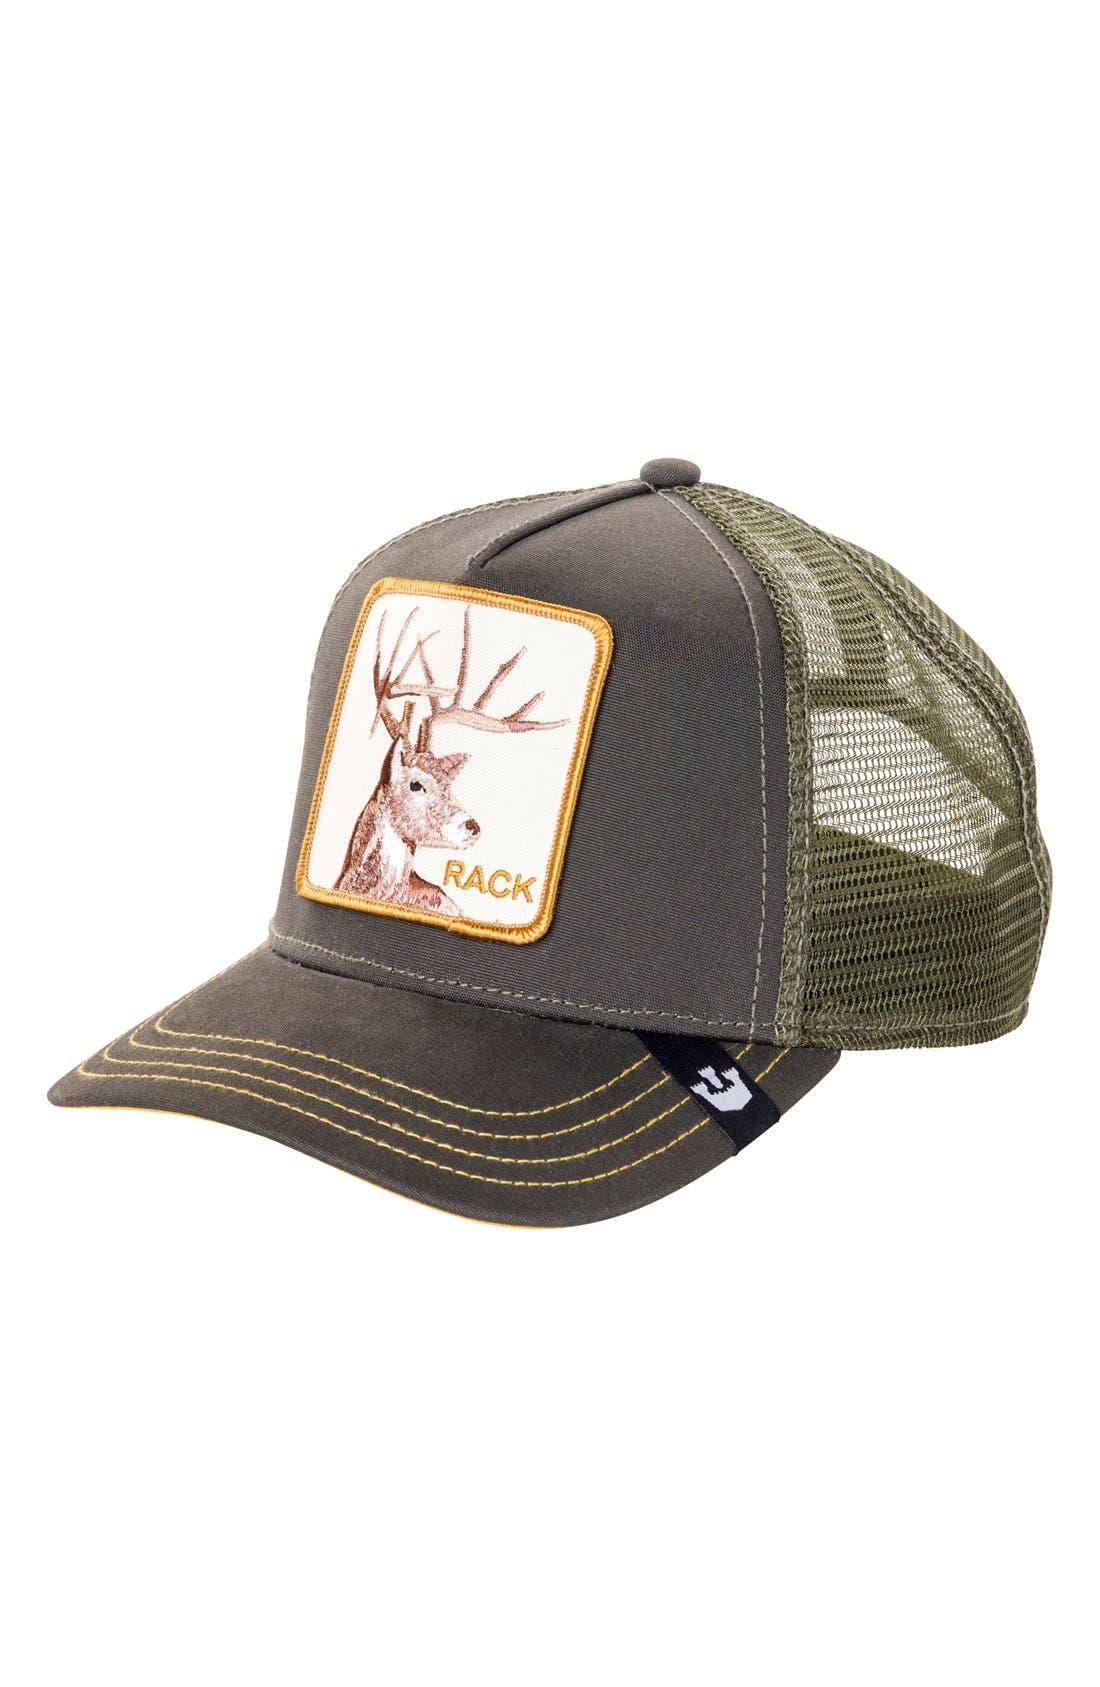 Main Image - Goorin Brothers 'Animal Farm - Rack' Trucker Hat